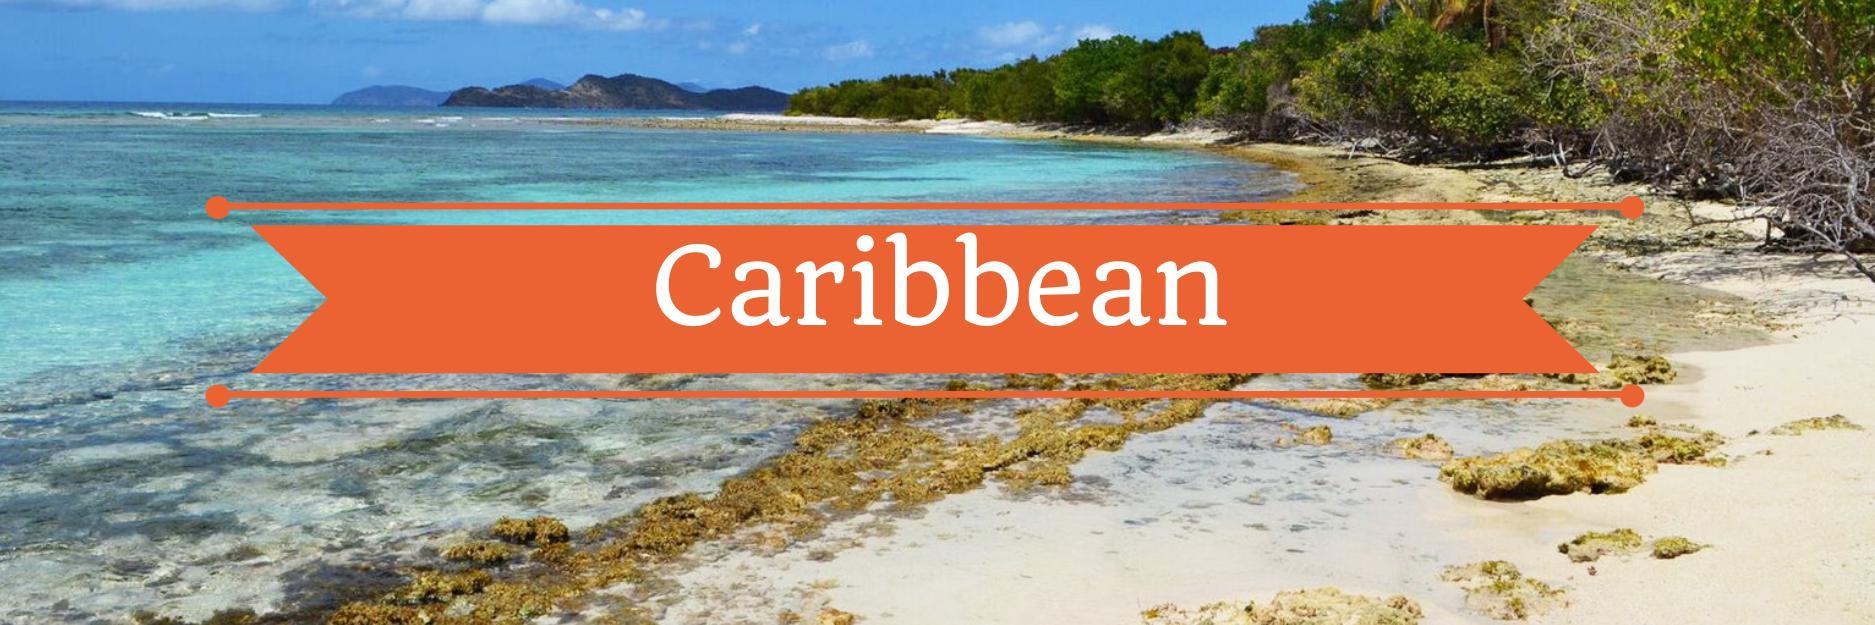 Caribbean Banner